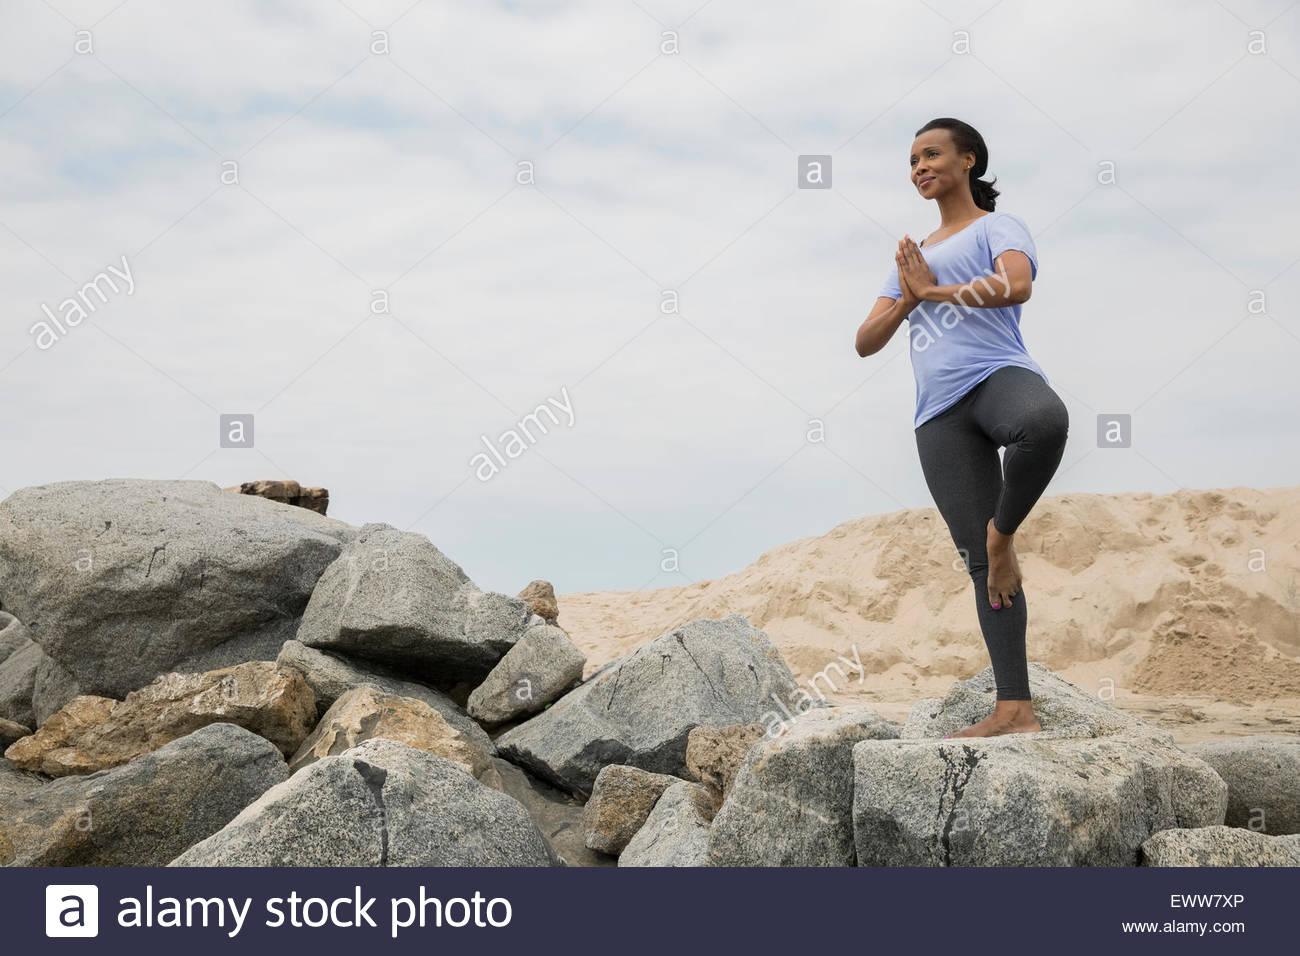 Woman in yoga tree pose on beach rocks - Stock Image